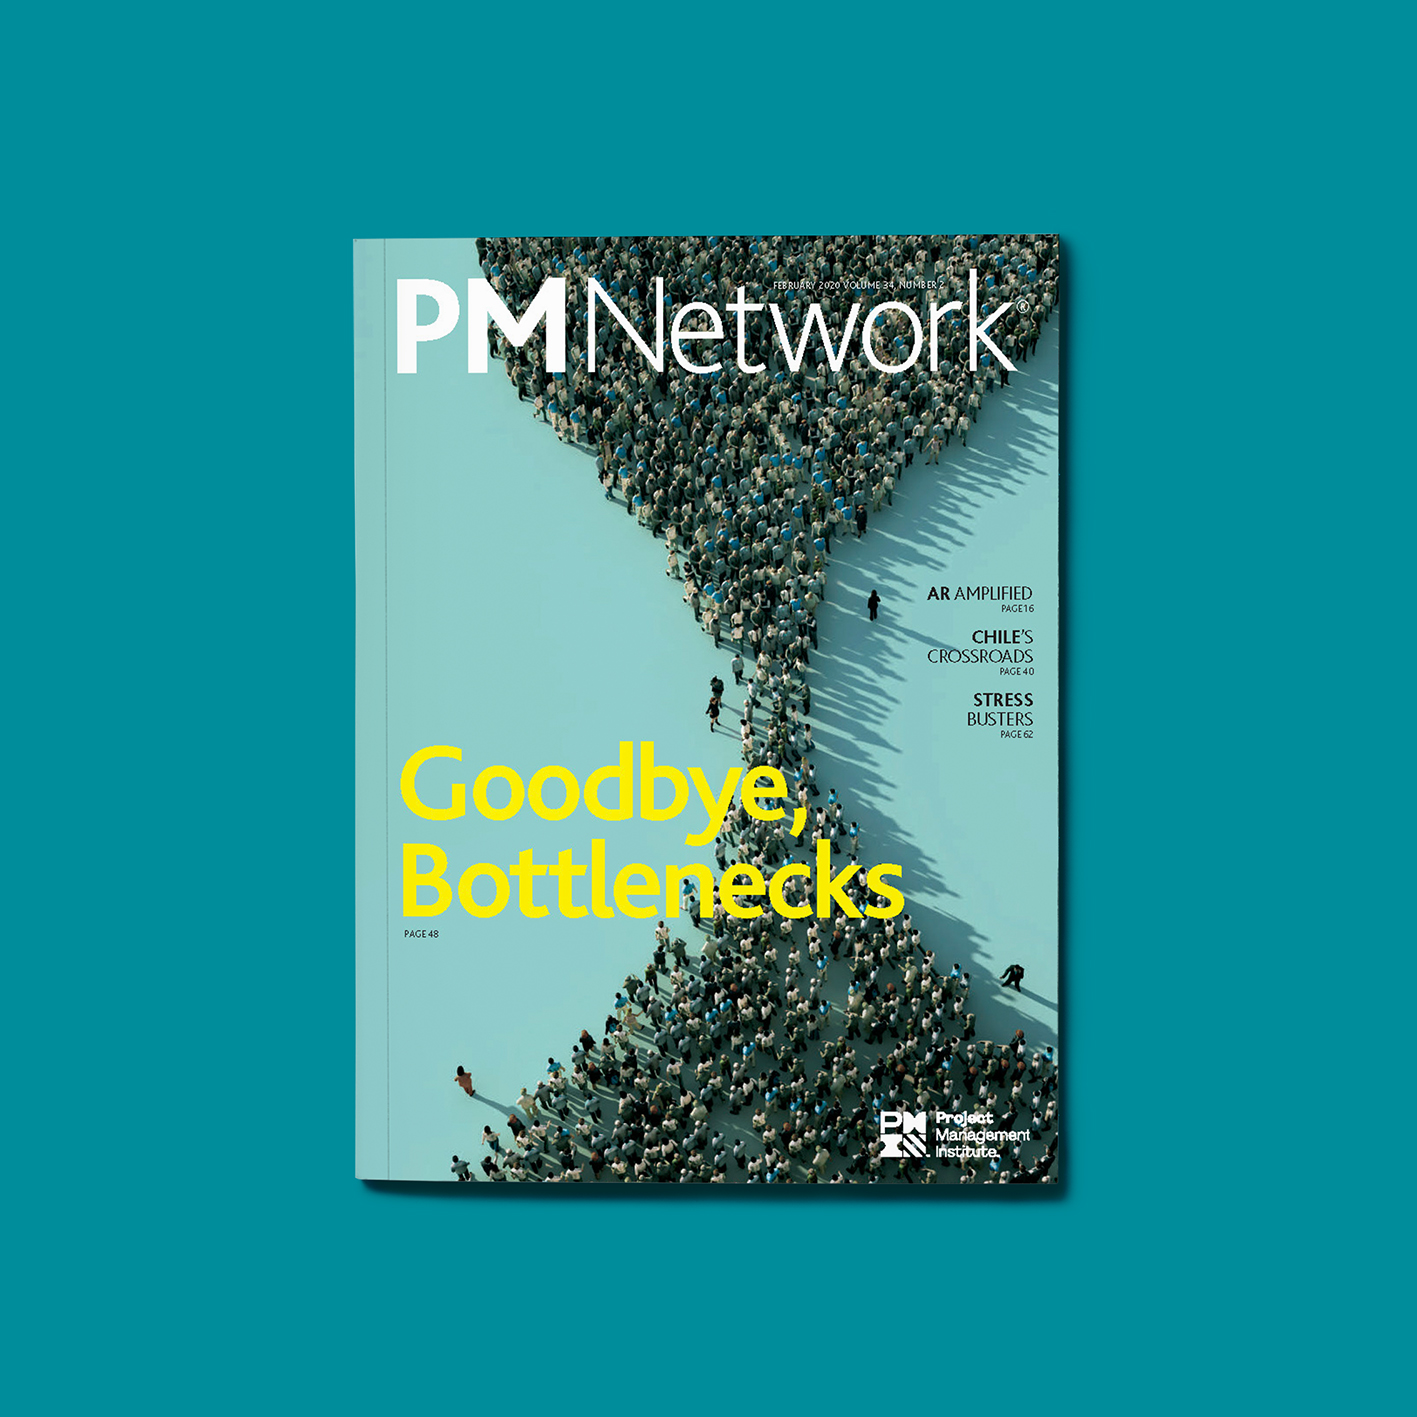 Daniel Diosdado: Banishing Bottlenecks. PM Network